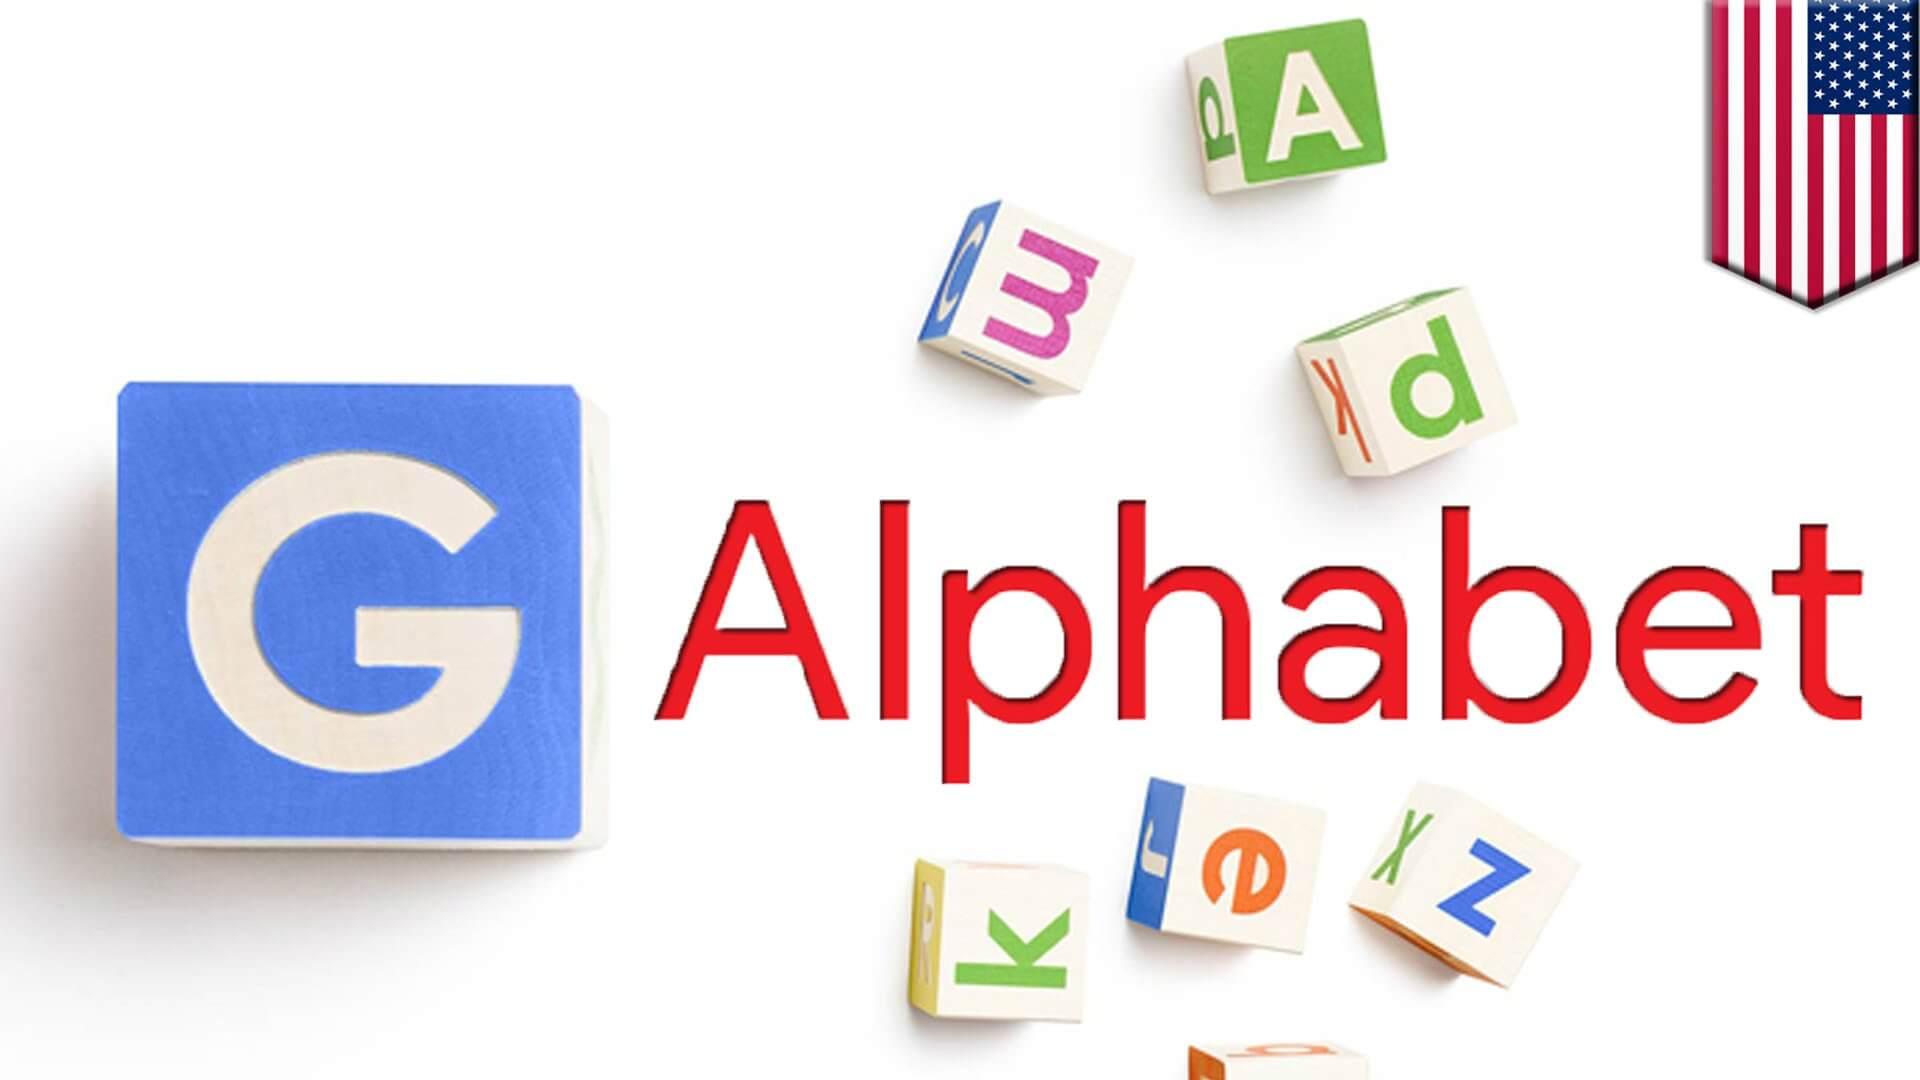 g-alphabet